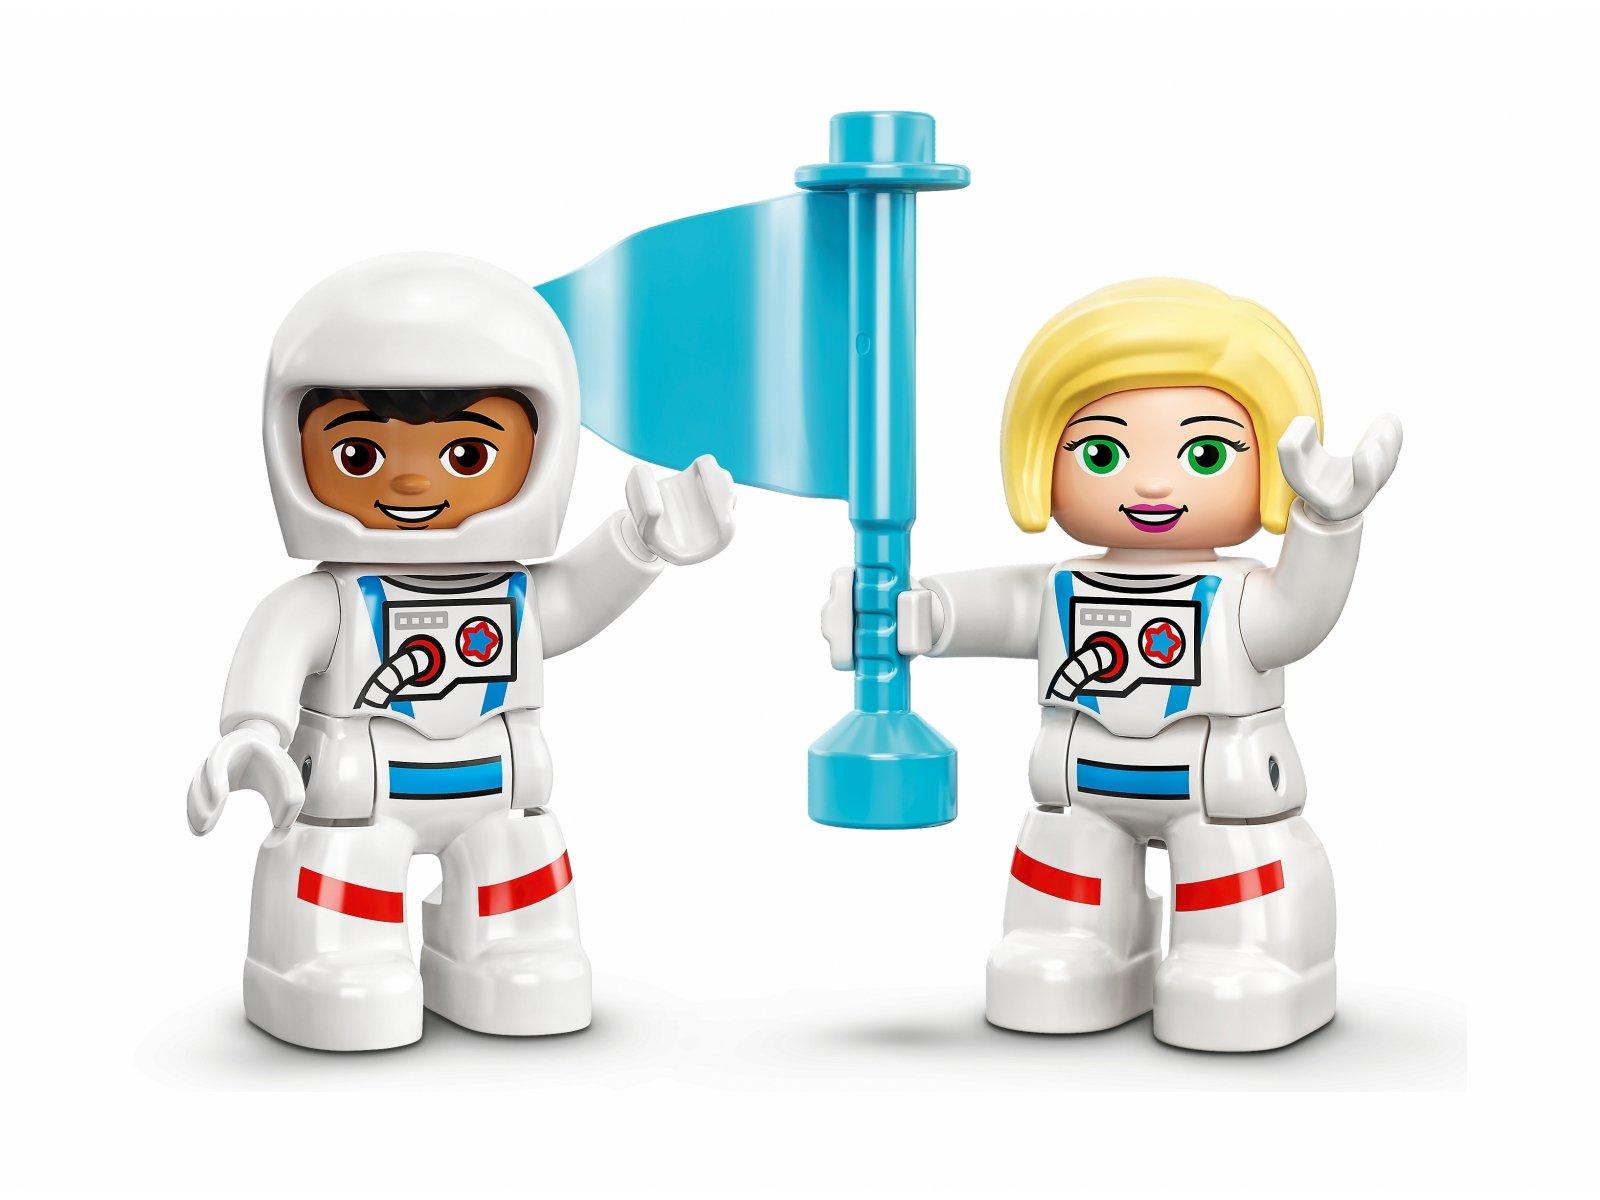 LEGO 10944 Duplo Lot promem kosmicznym